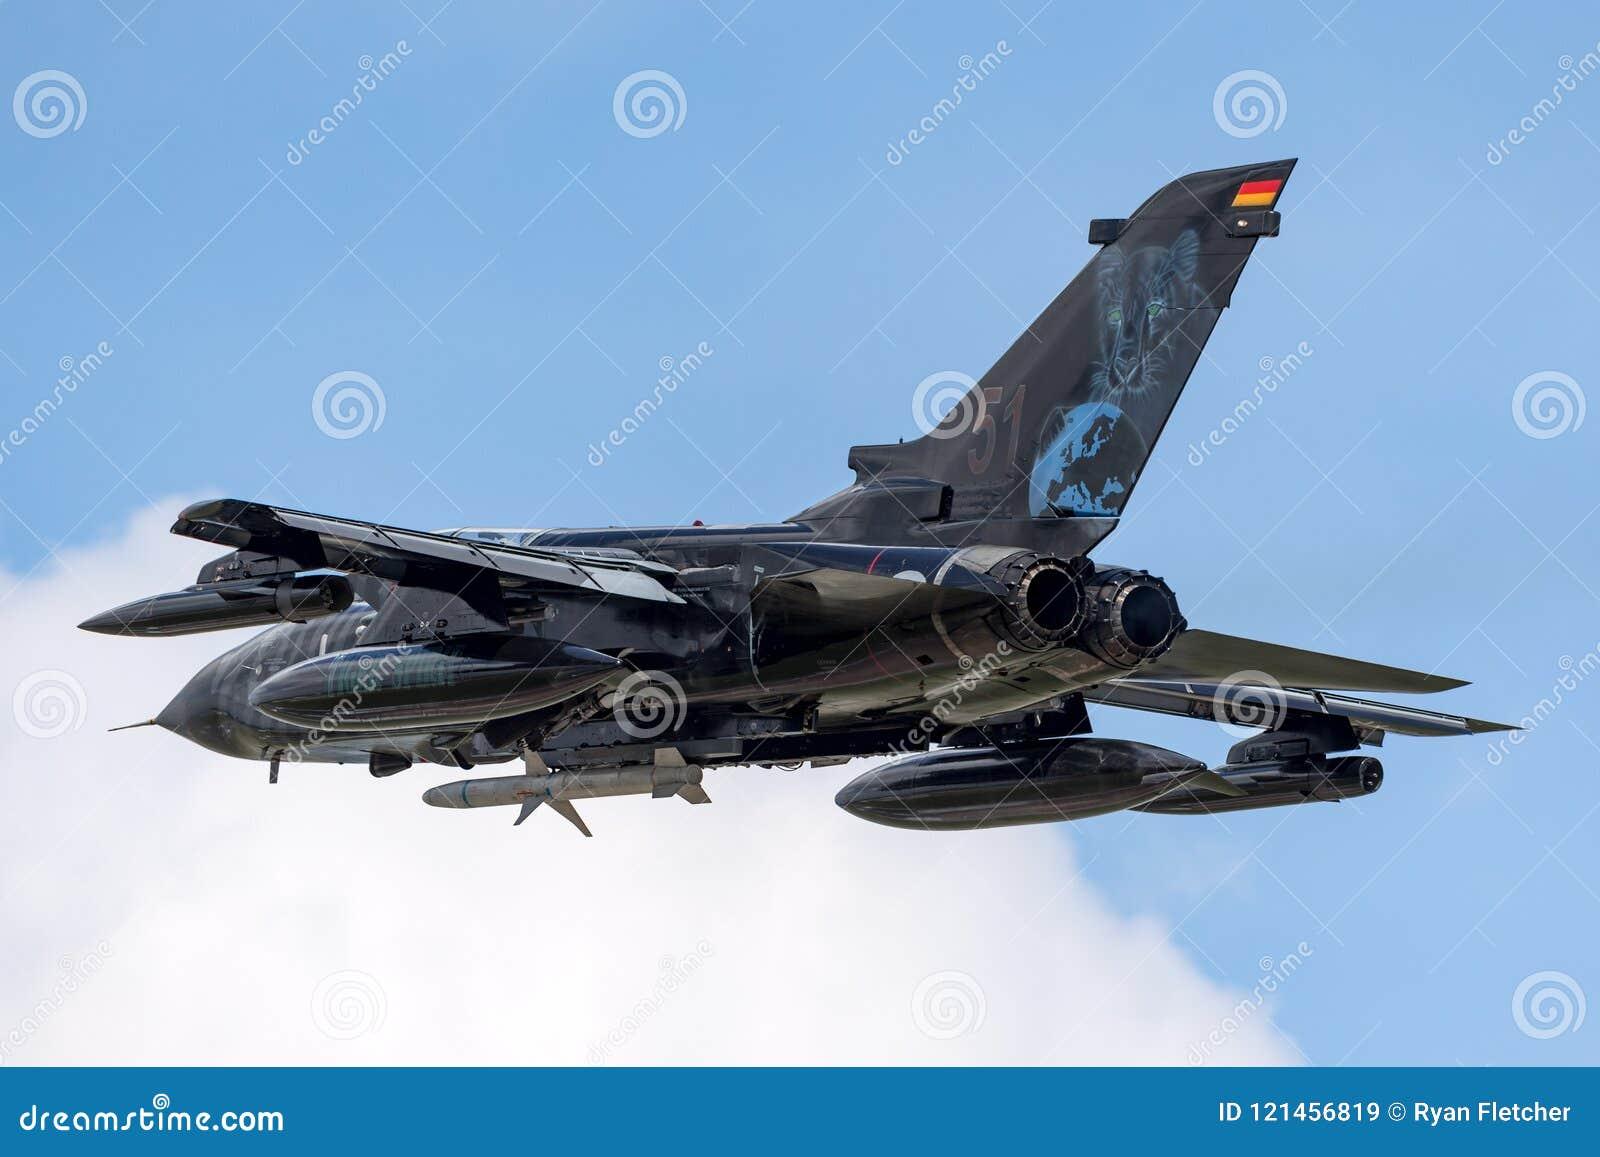 German Air Force Luftwaffe Panavia Tornado ECR Electric Combat